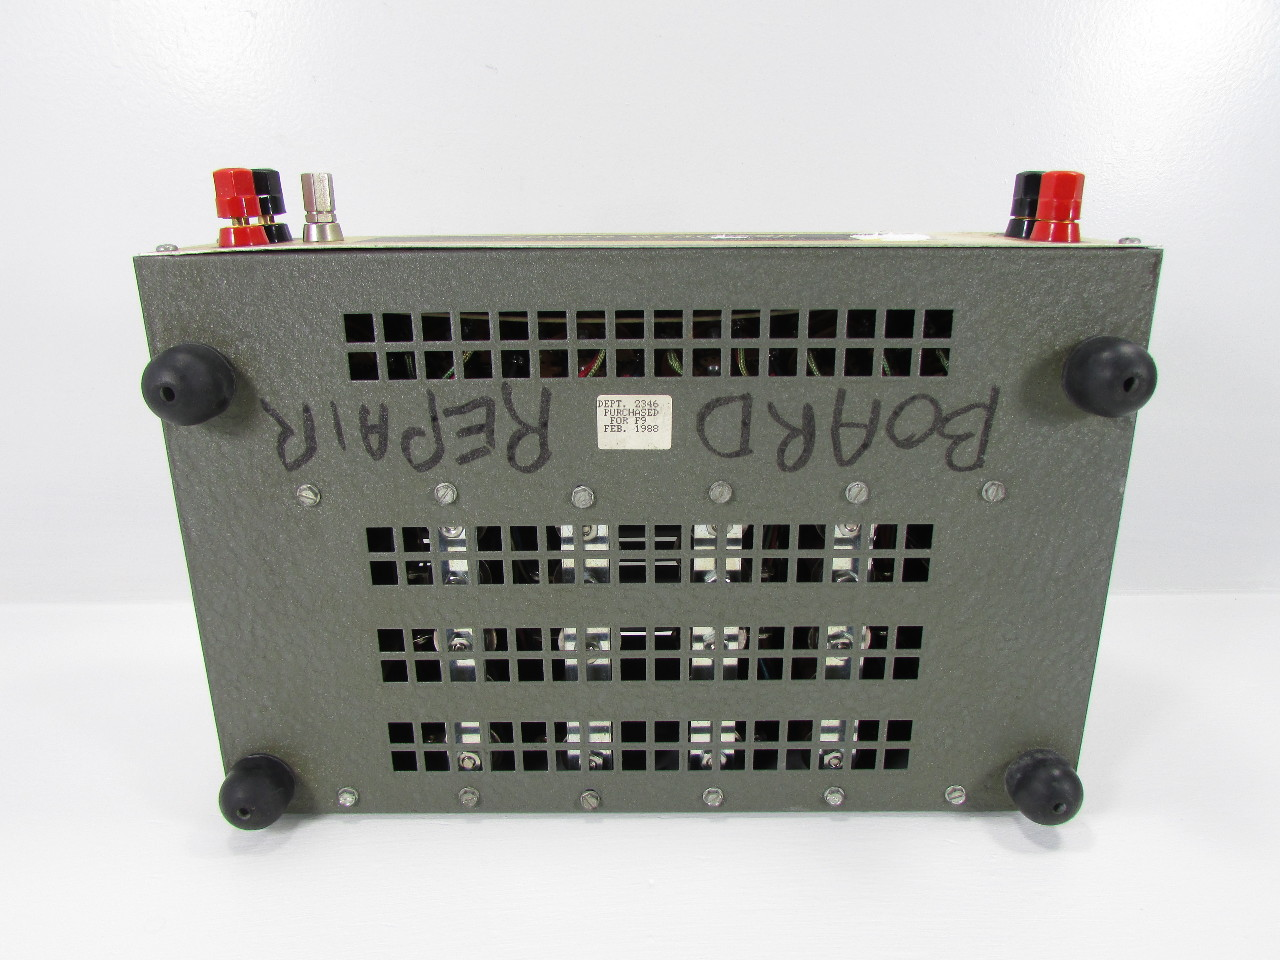 clarostat 240 c power resistor decade box premier equipment solutions inc. Black Bedroom Furniture Sets. Home Design Ideas